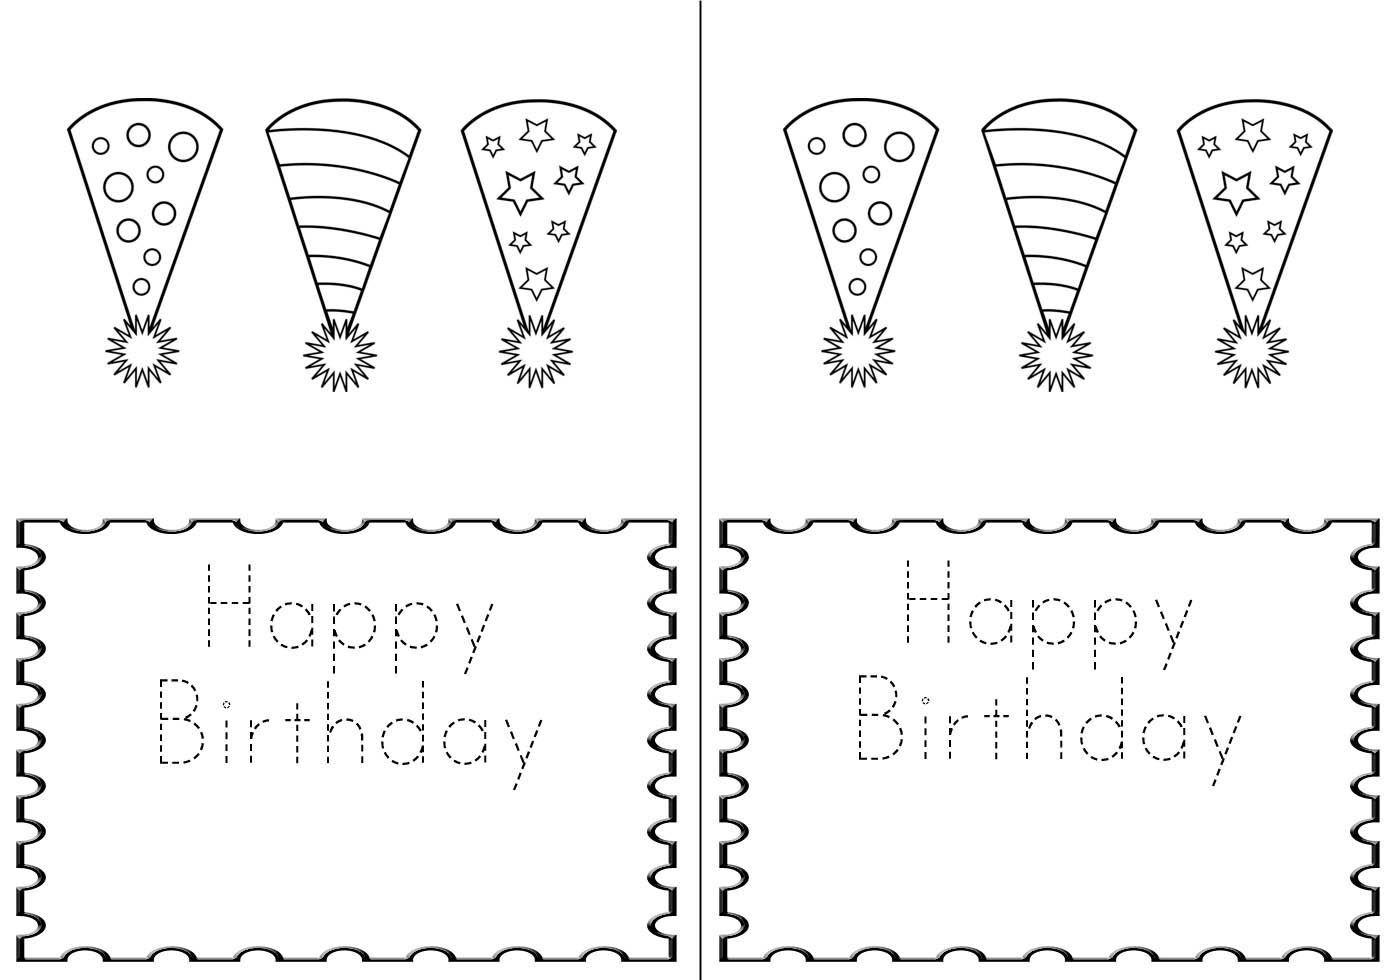 005 Frightening Quarter Fold Birthday Card Template Free High Def  DownloadFull